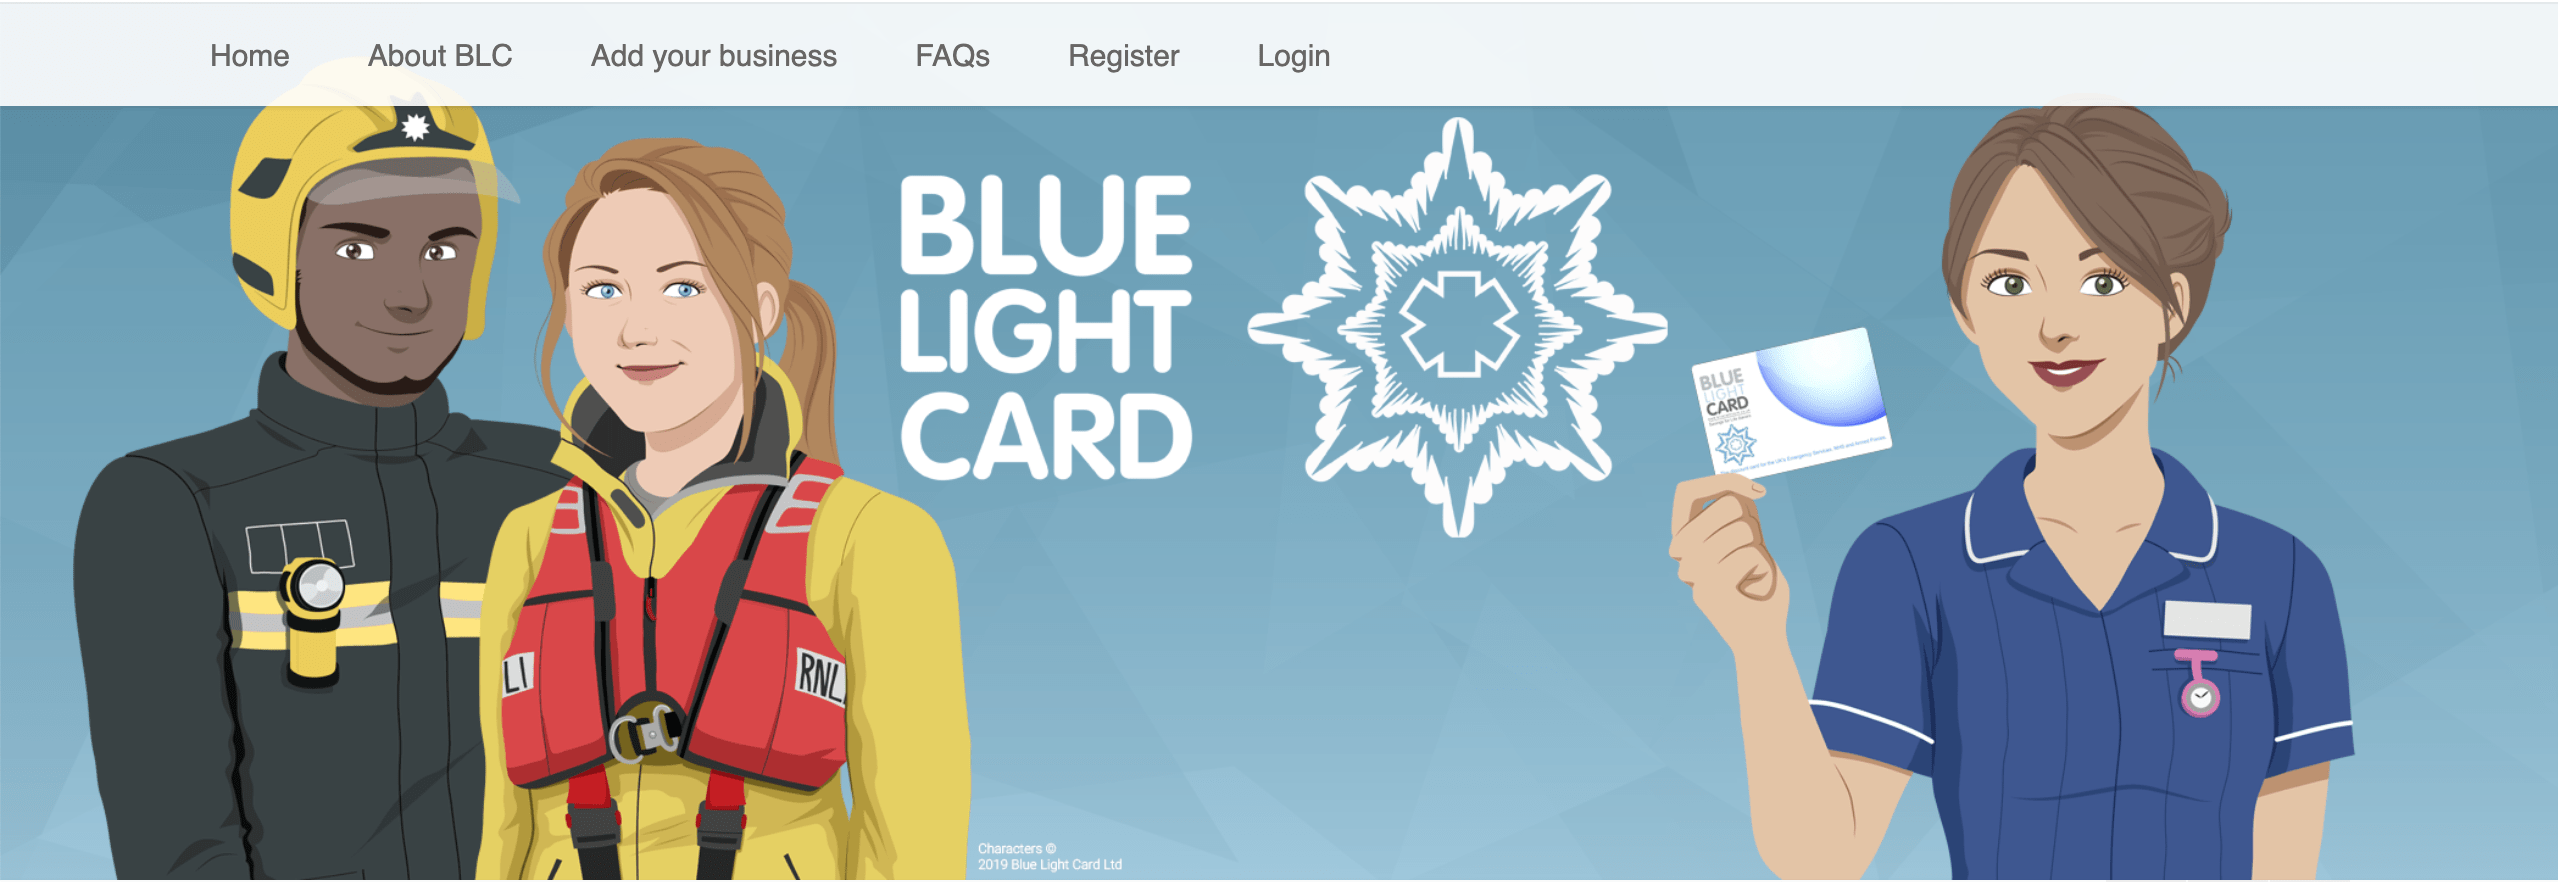 blue light card domino's dicount